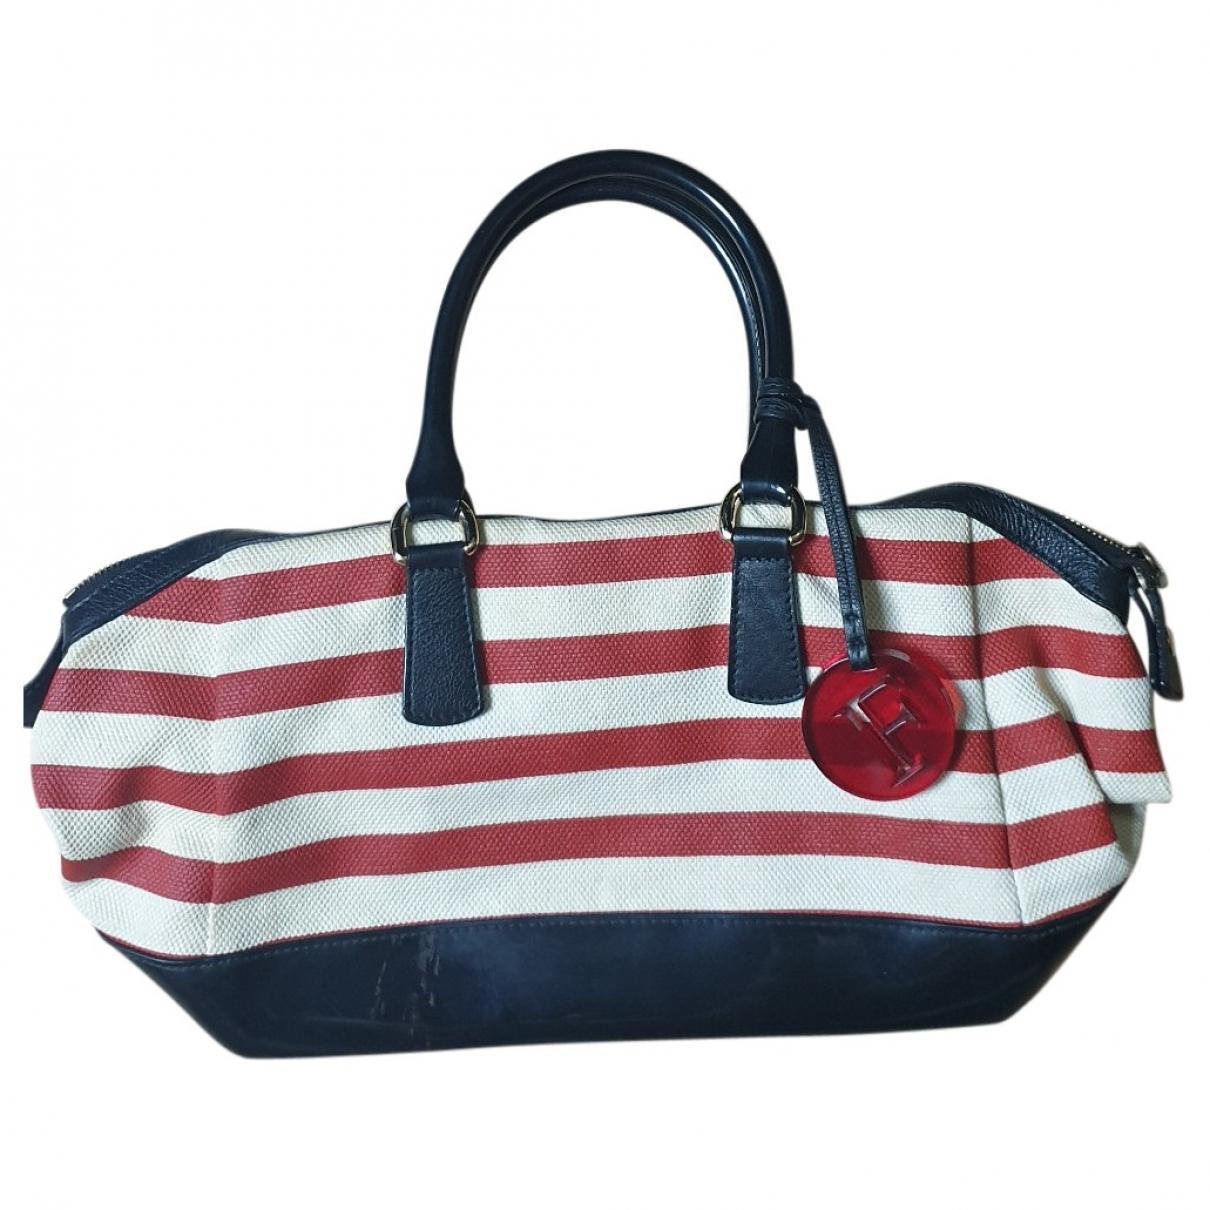 Furla \N Black Cloth handbag for Women \N